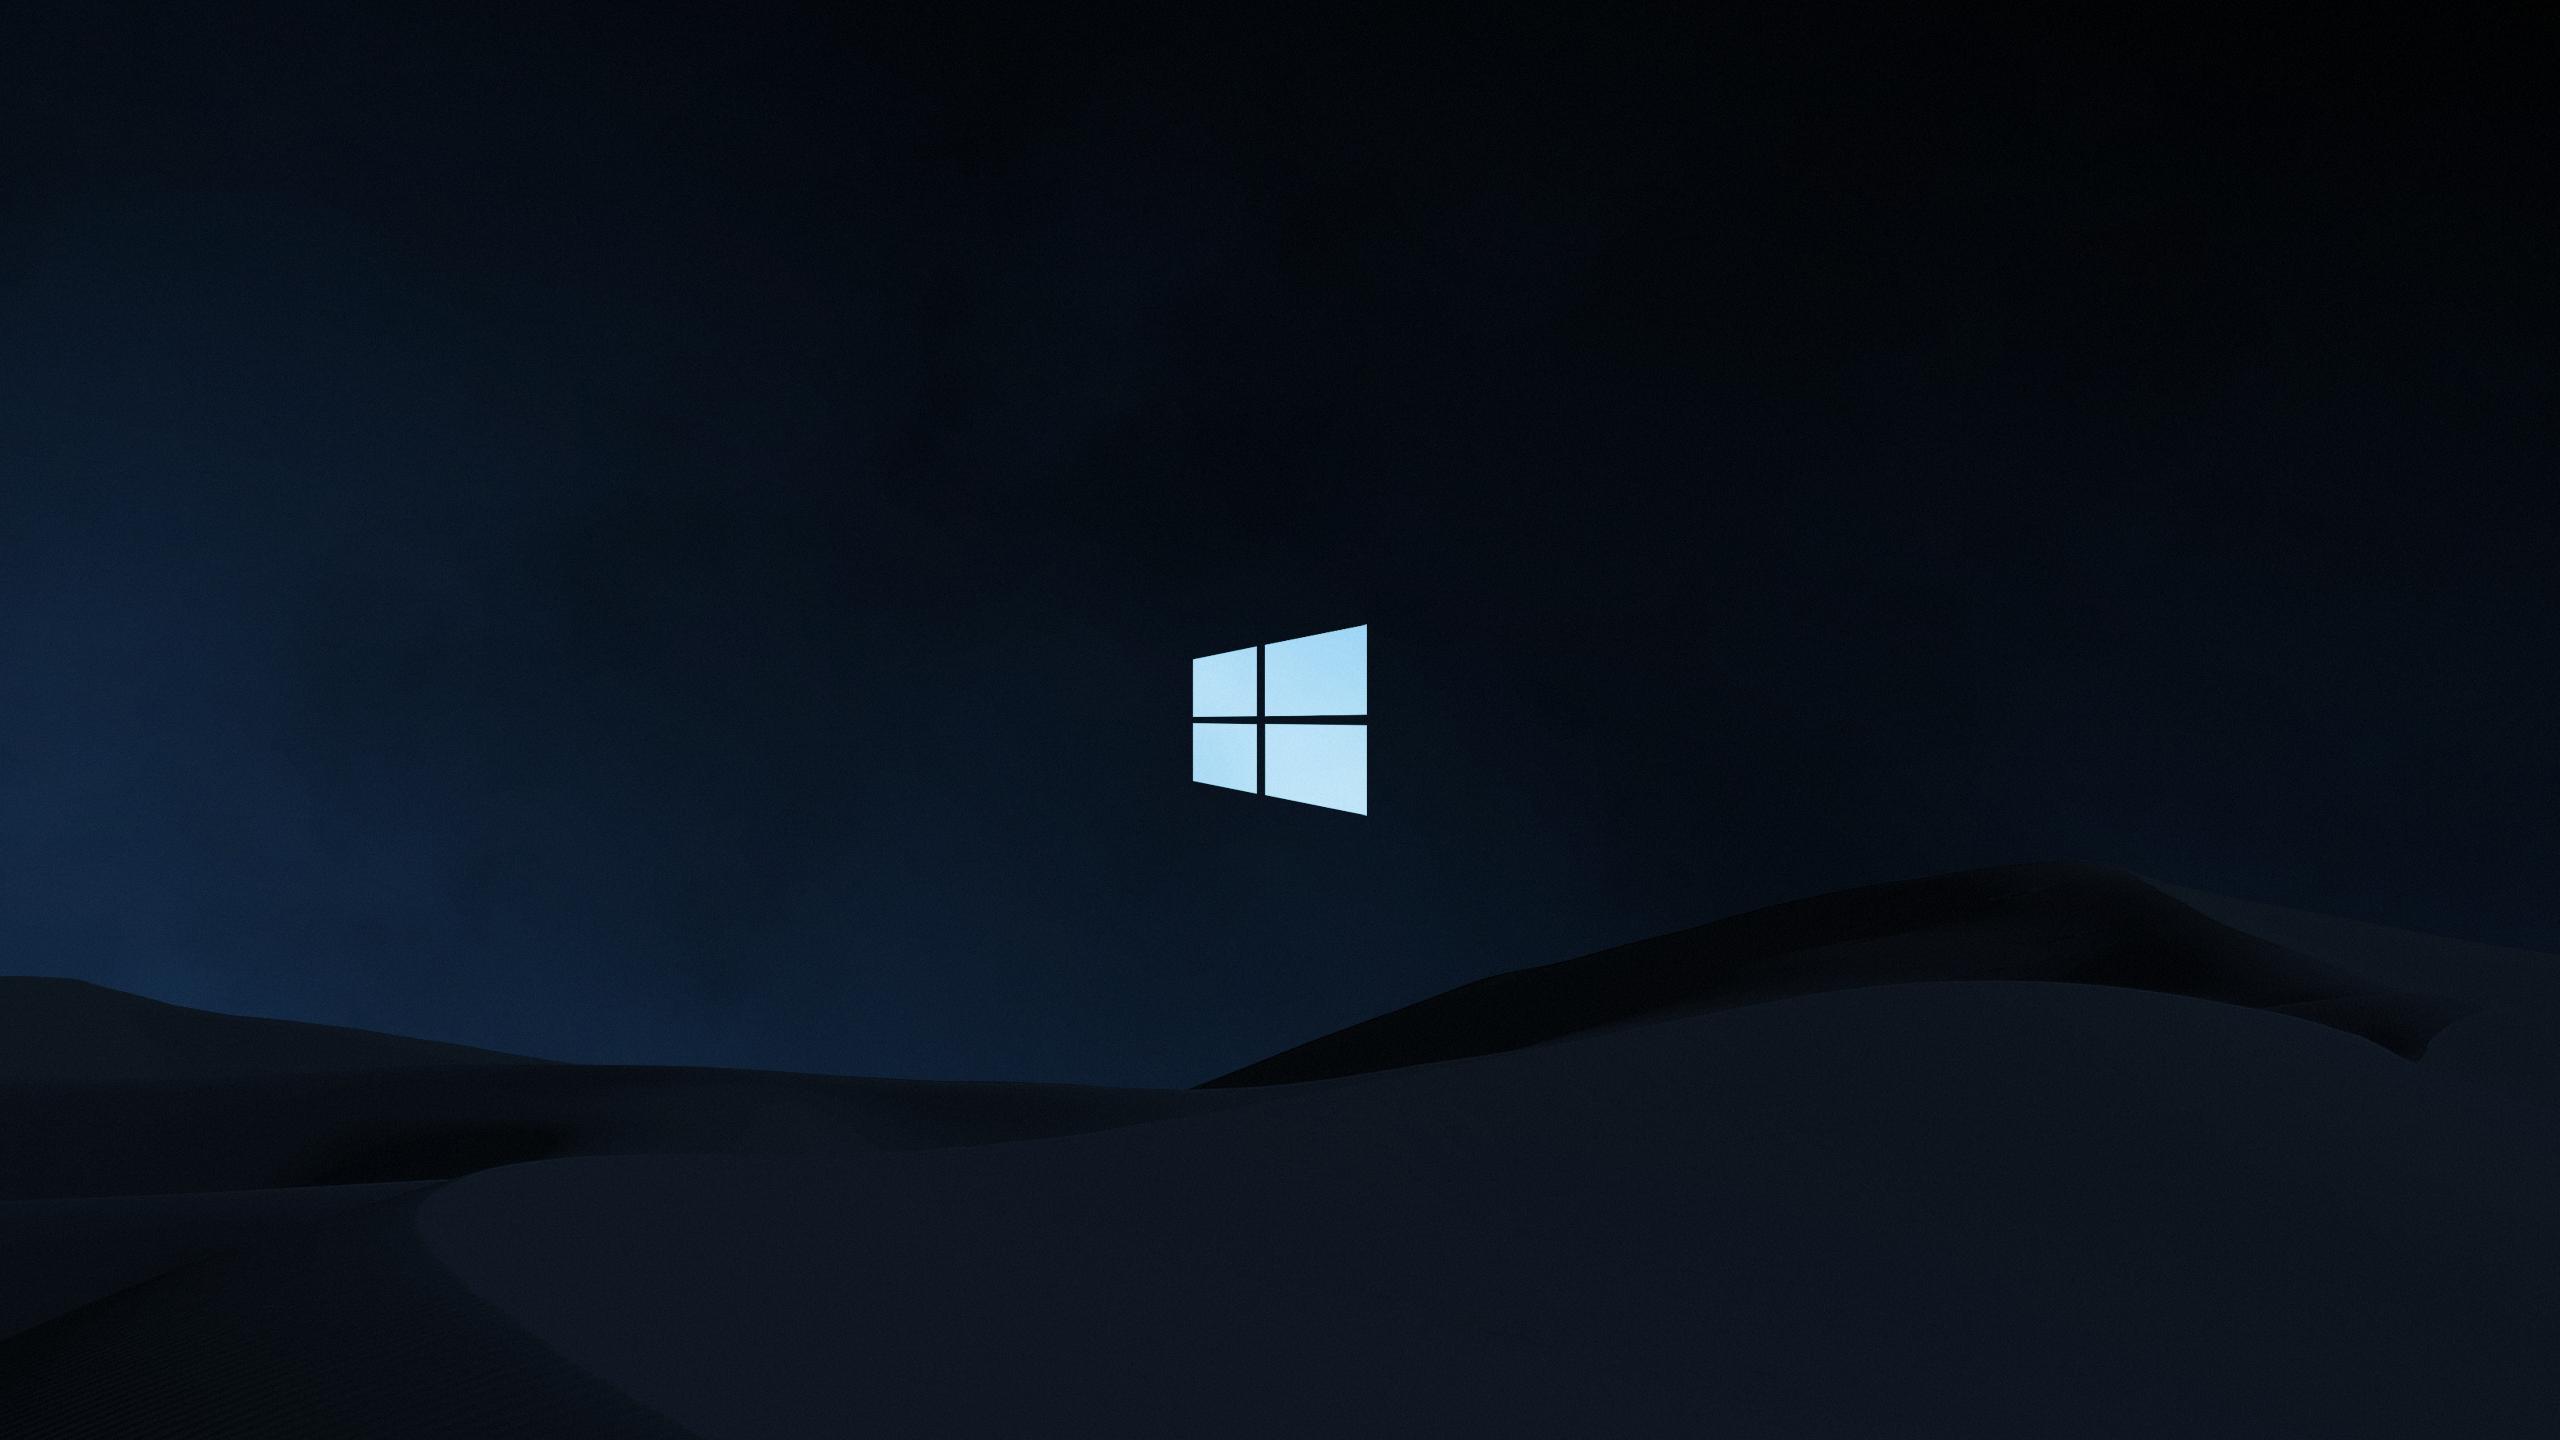 Clean Windows Background Desktop wallpaper art Microsoft 2560x1440